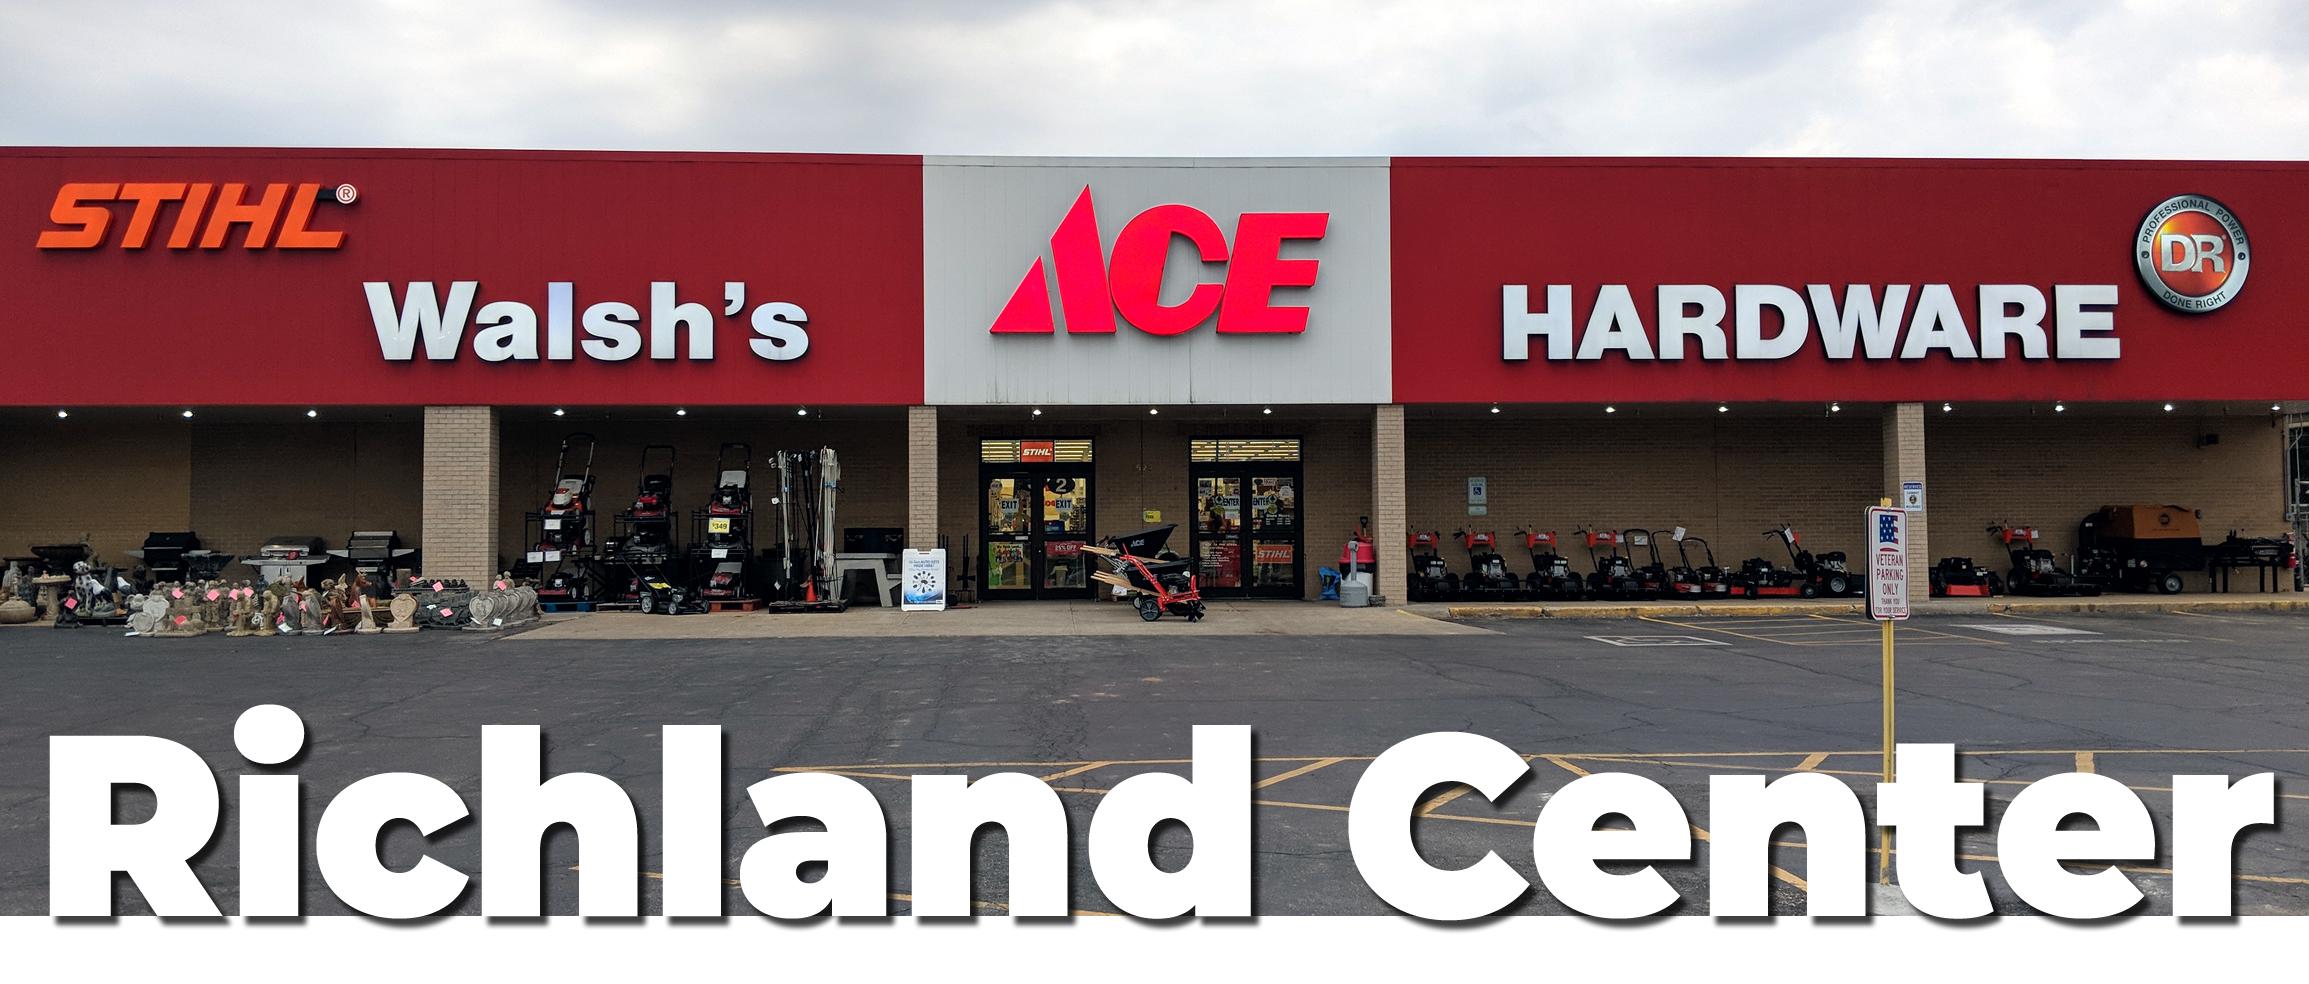 Richland Center — Walsh's Ace Hardware